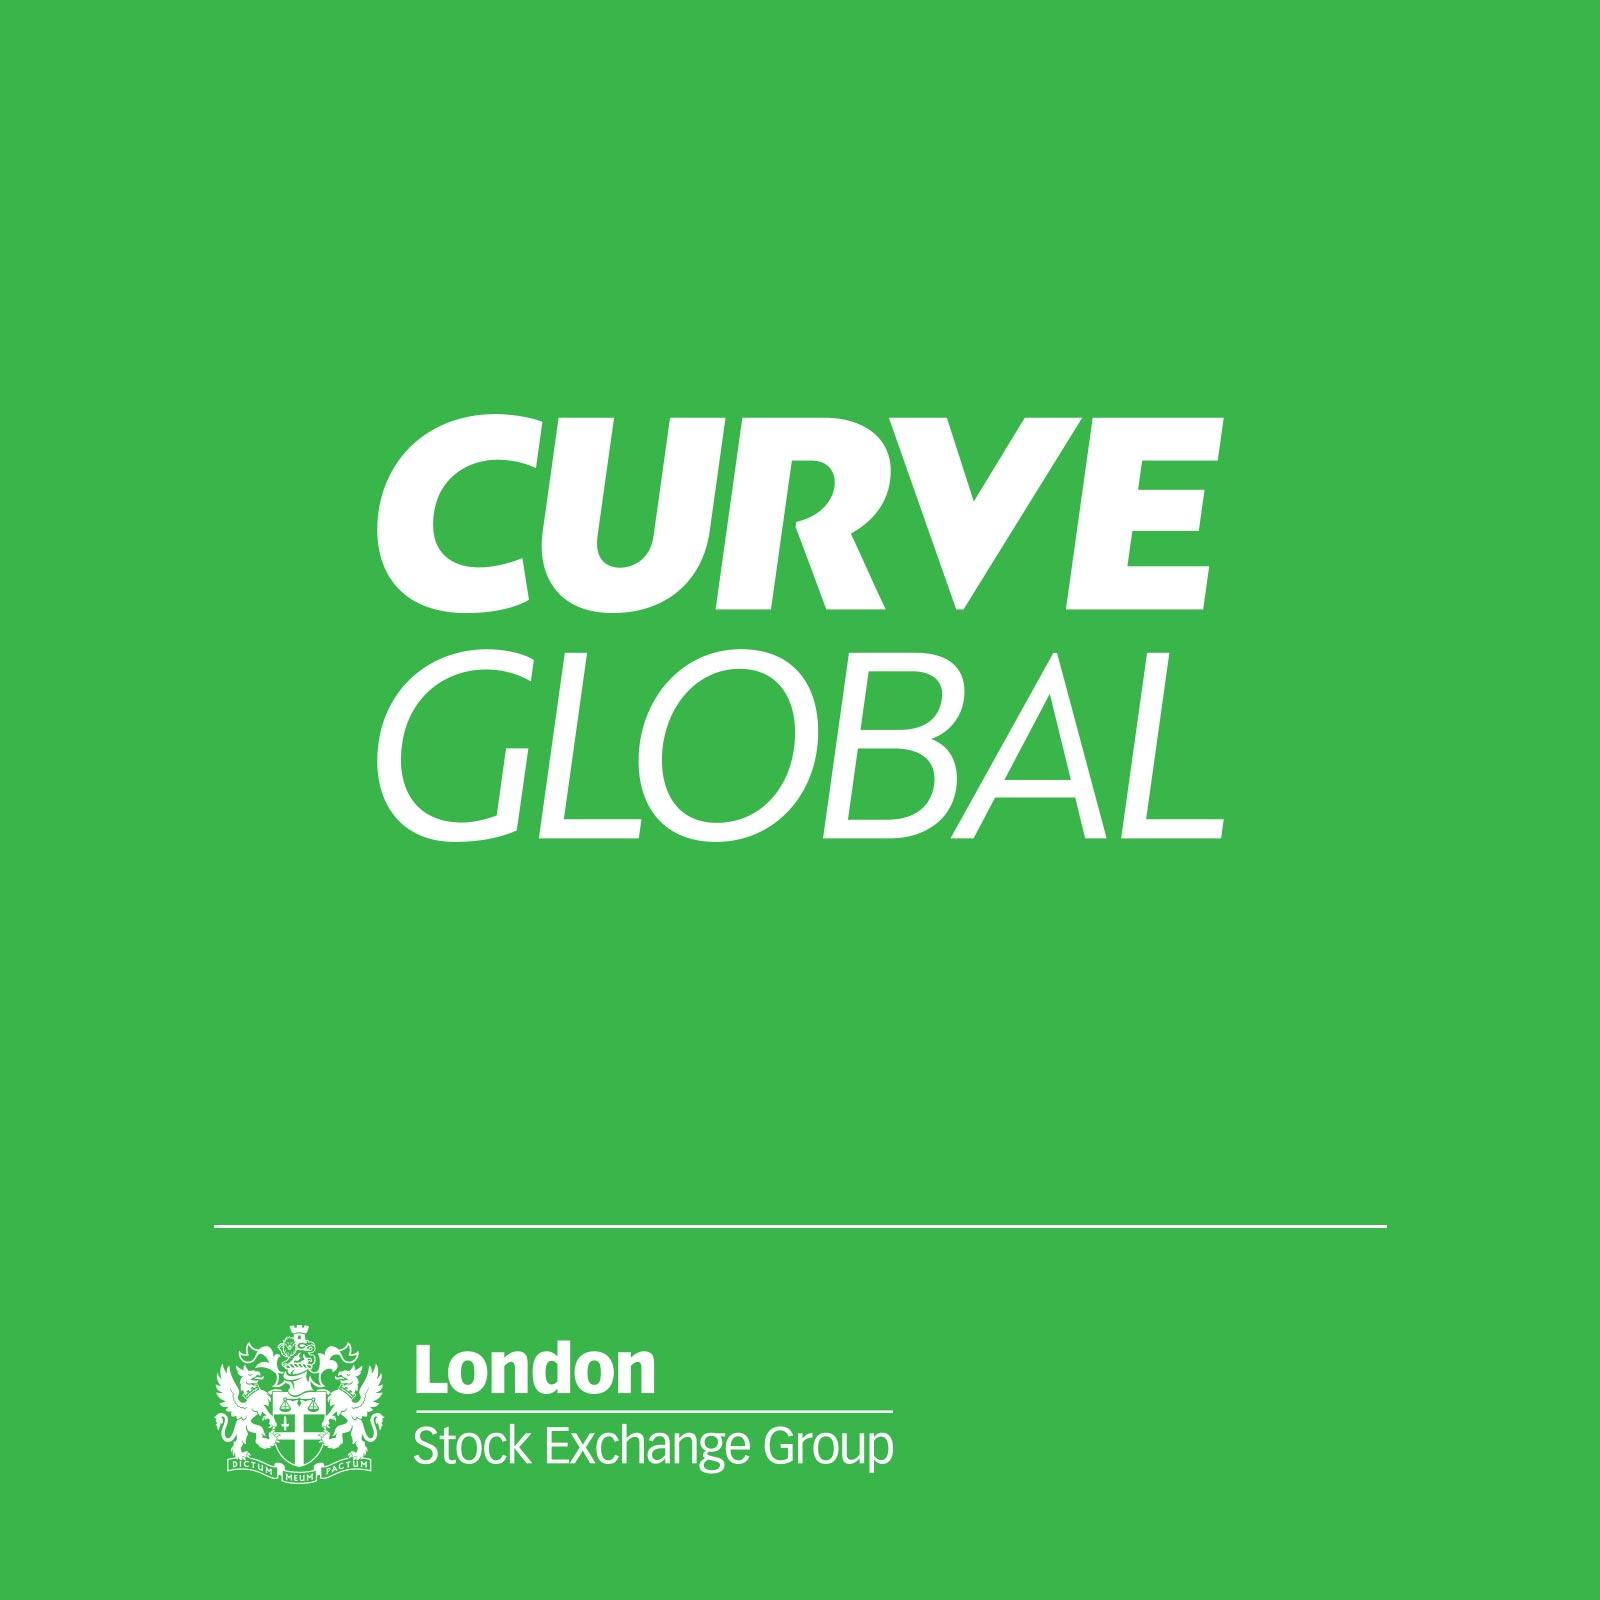 Curve-global-logo_V2.jpg